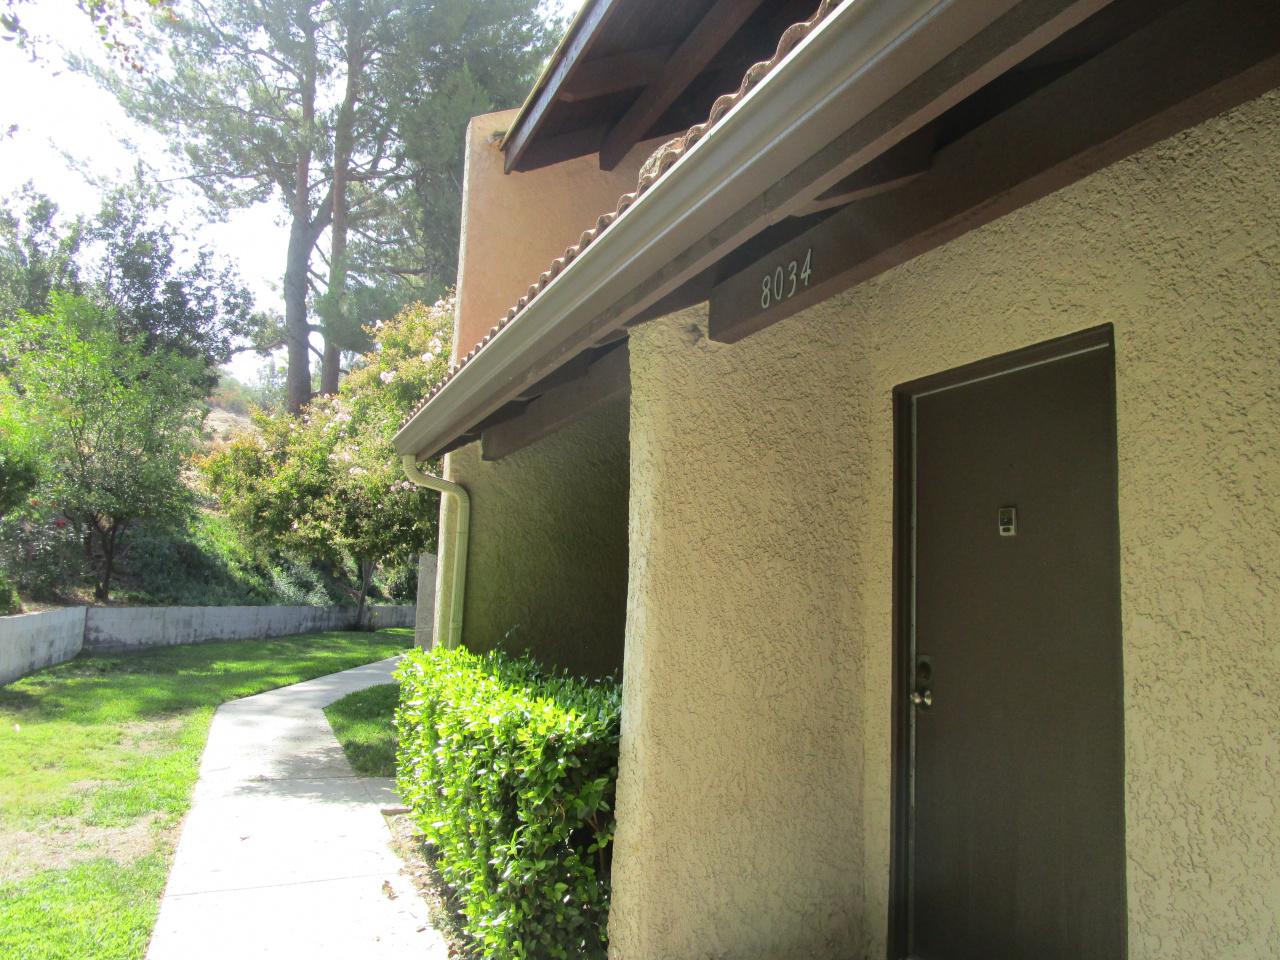 2215 N. Fairview St.